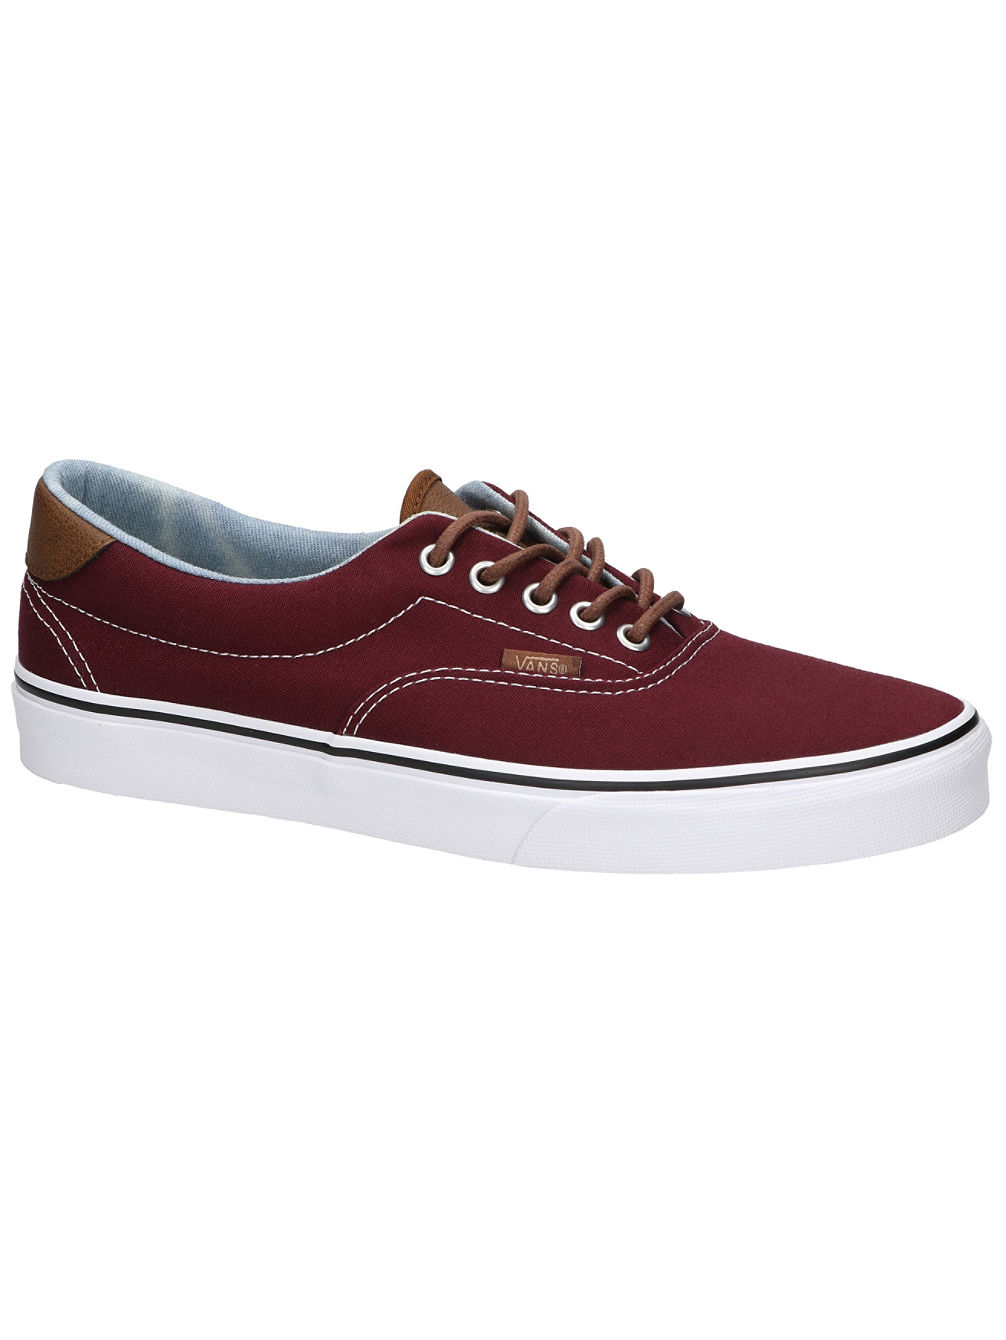 b528ab7806 Buy Vans C L Era 59 Sneakers online at Blue Tomato